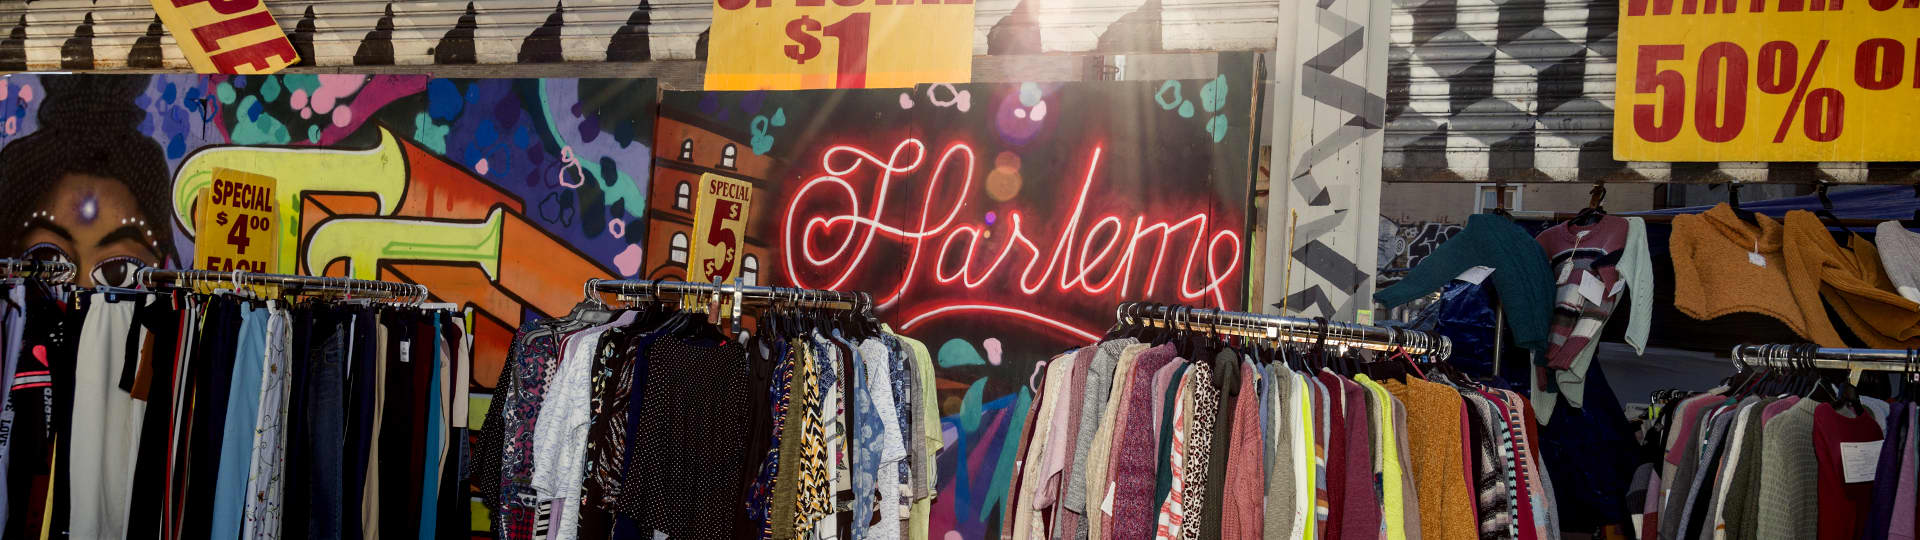 East Harlem,